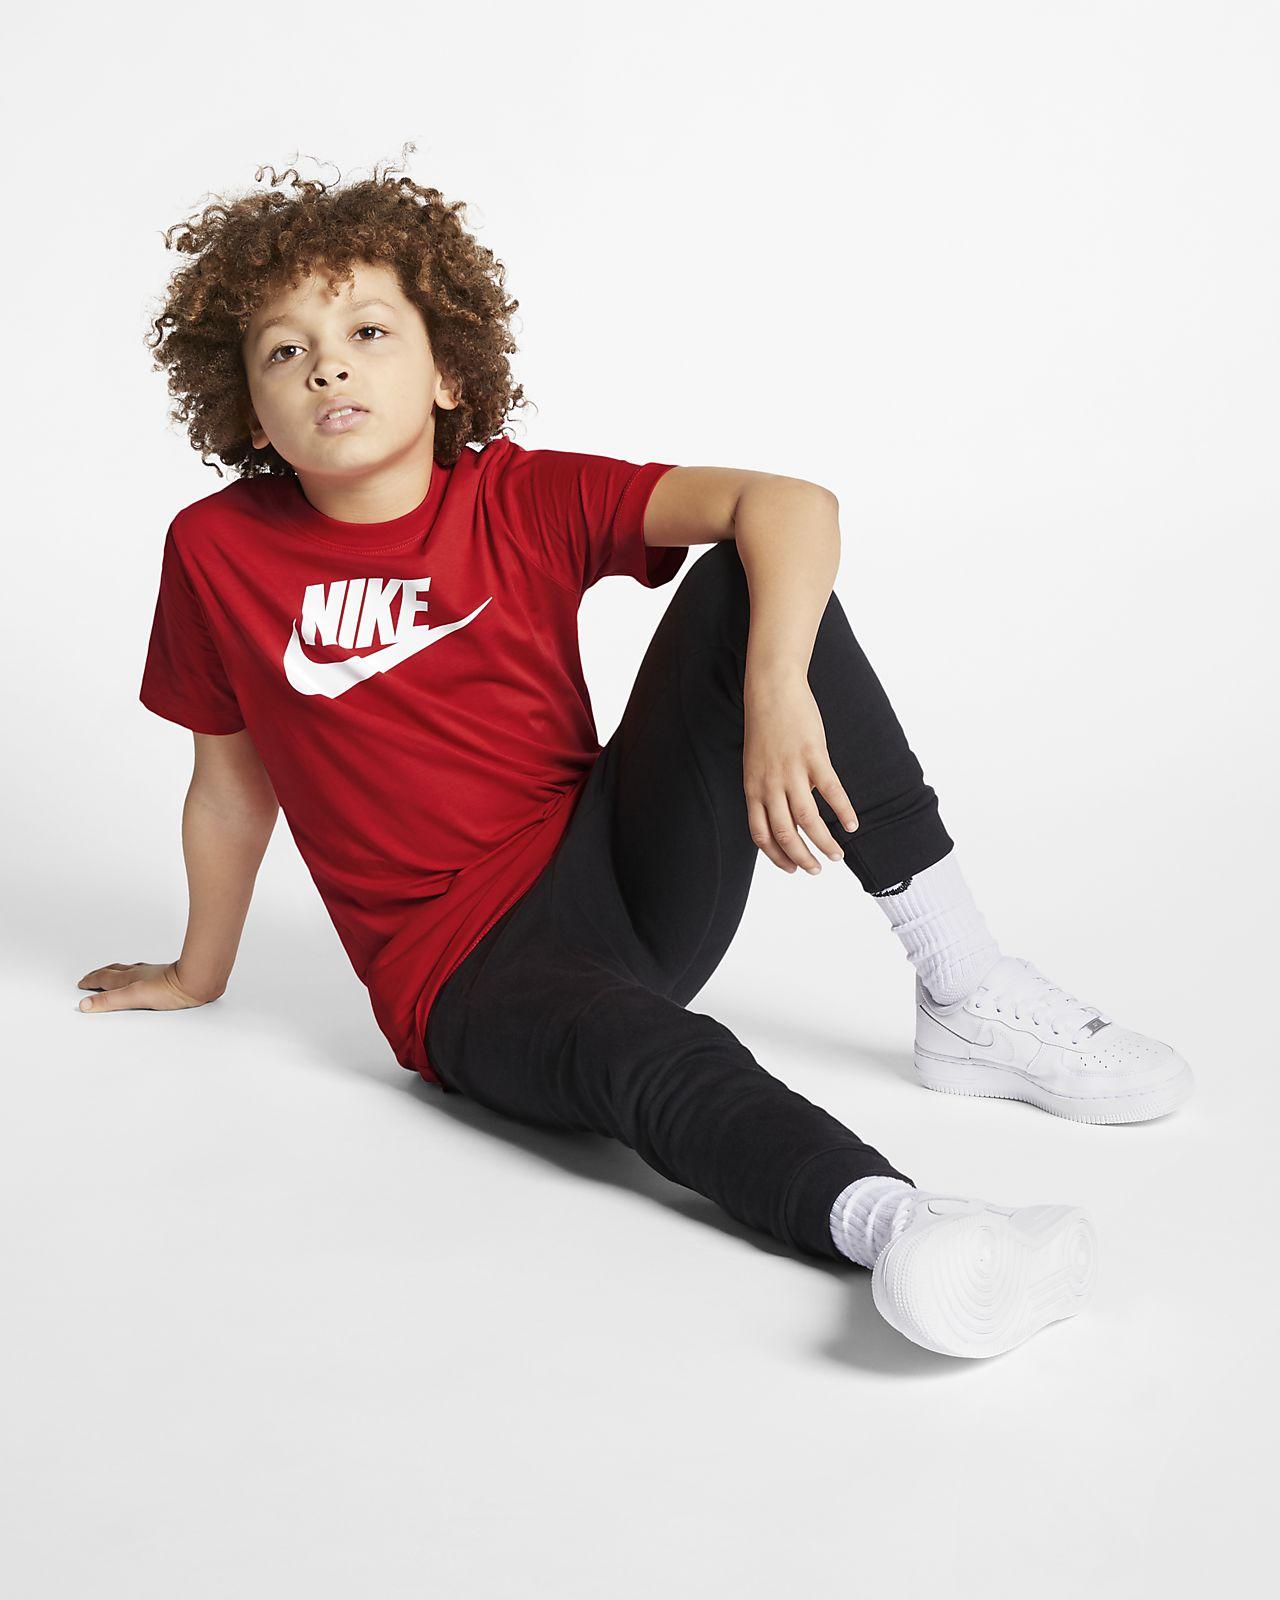 c68a3c2fc657 Nike Sportswear Older Kids  (Boys ) T-Shirt. Nike.com GB